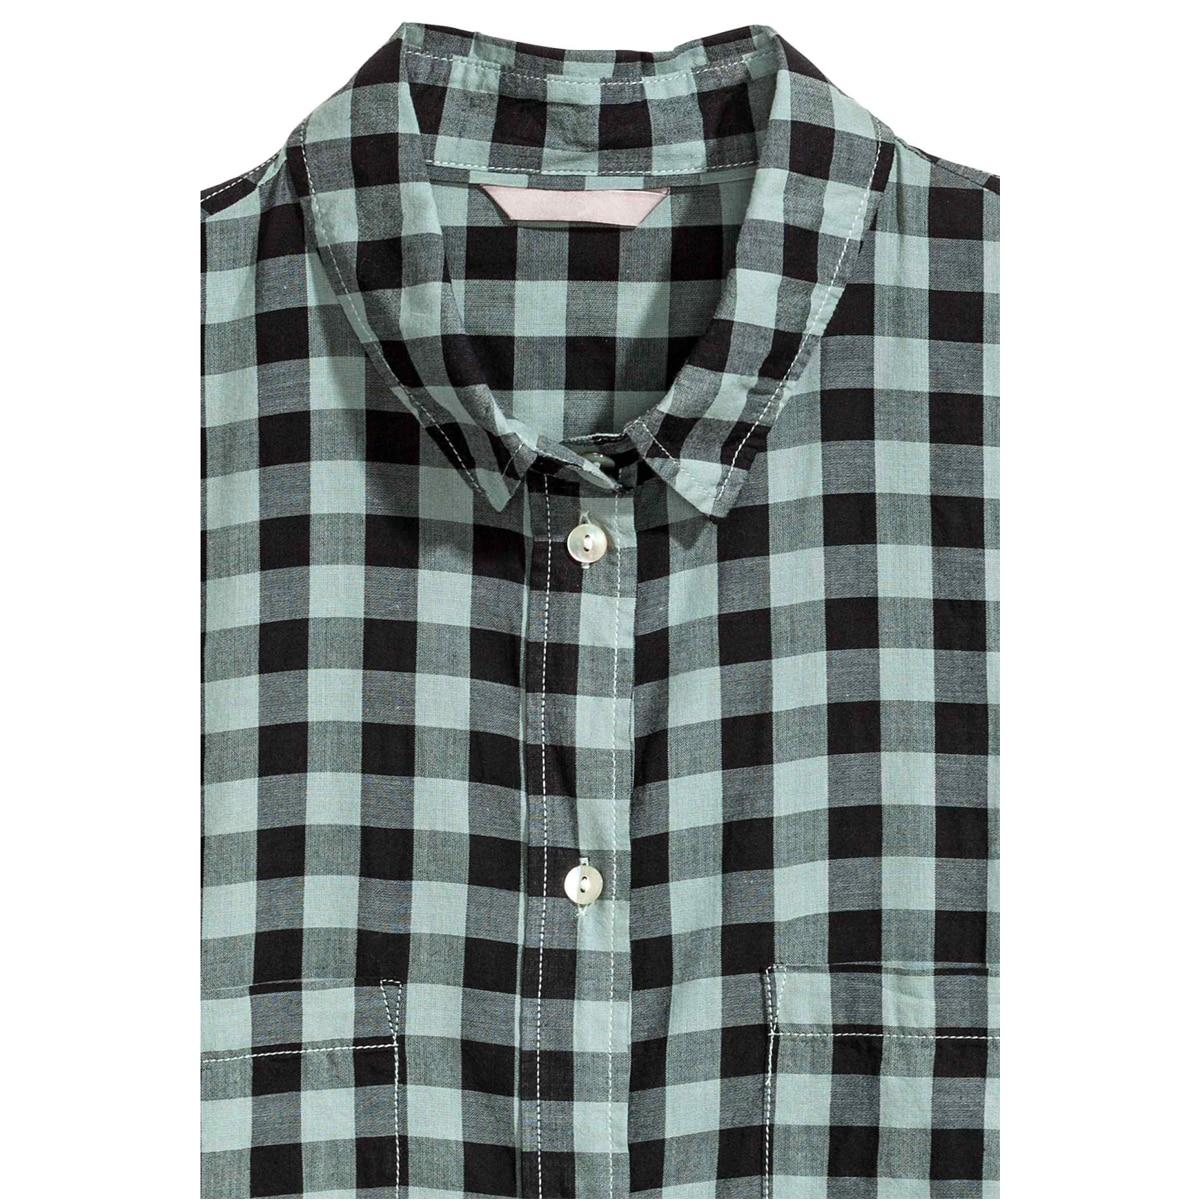 Kissmilk Plus Size Women Button Down Two Pocket Front Shirt Turn Down Collar Plaid Basic Shirt Large Size Casual Loose Shirt 3